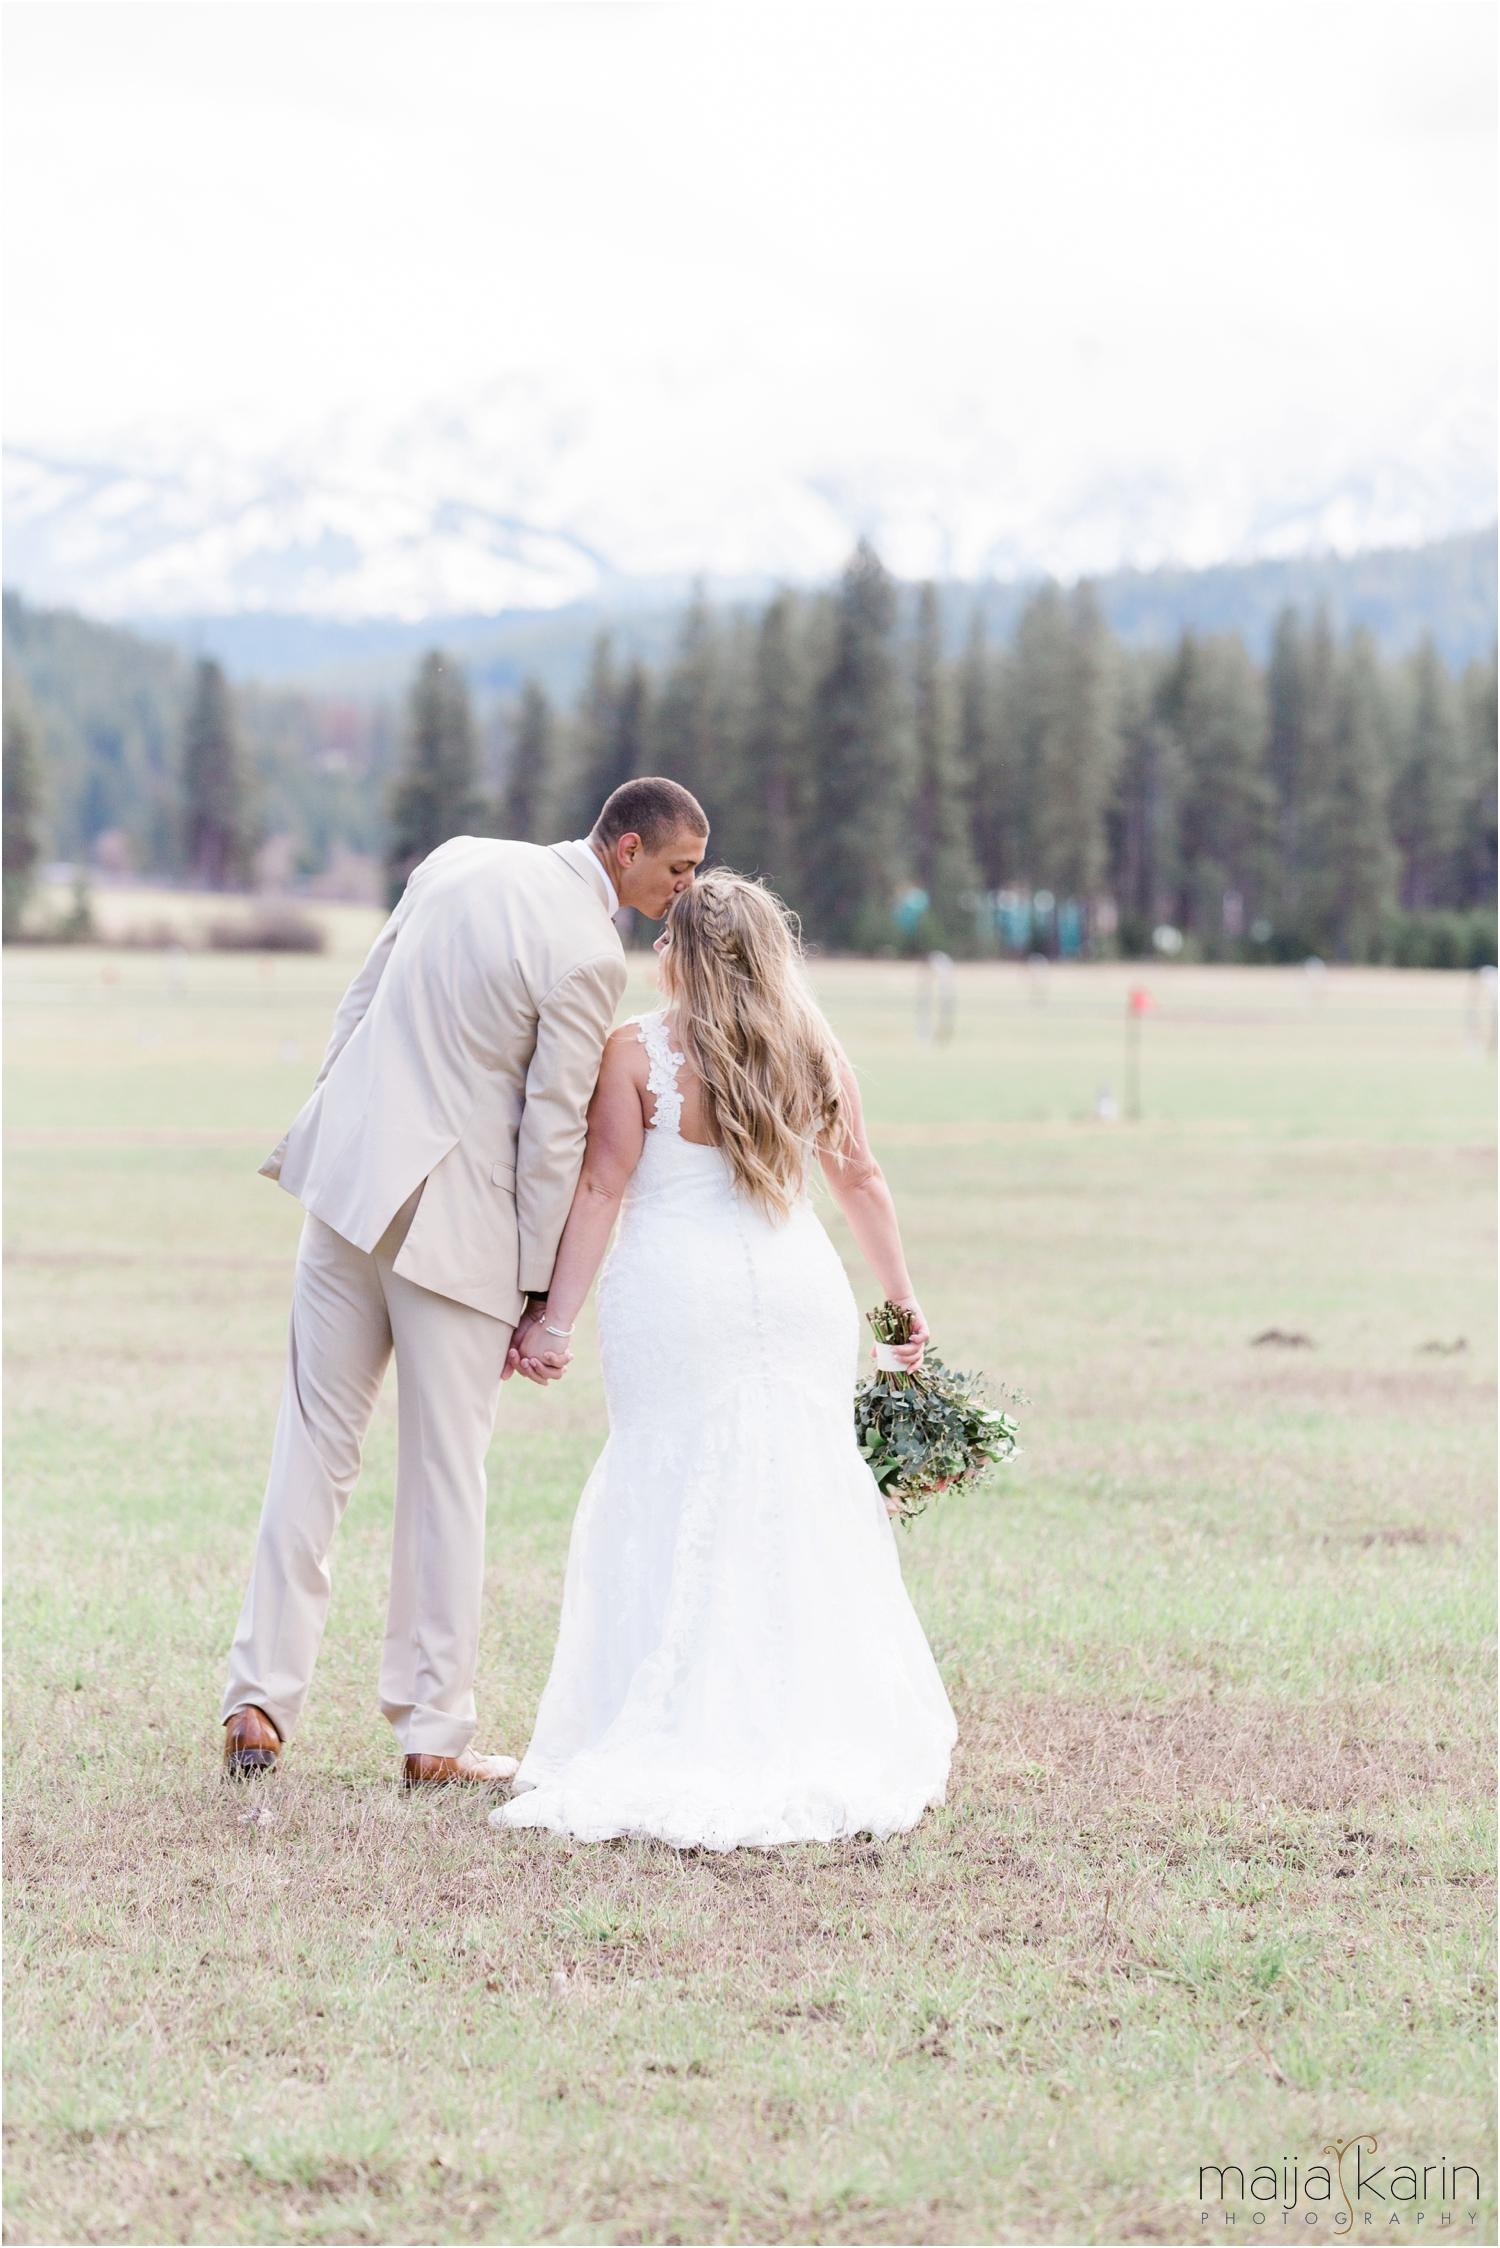 Mountain Springs Lodge wedding Maija Karin Photography%0DMaija Karin Photography%0DMaija Karin Photography%0DMountain-Springs-Lodge-Wedding-Maija-Karin-Photography_0061.jpg